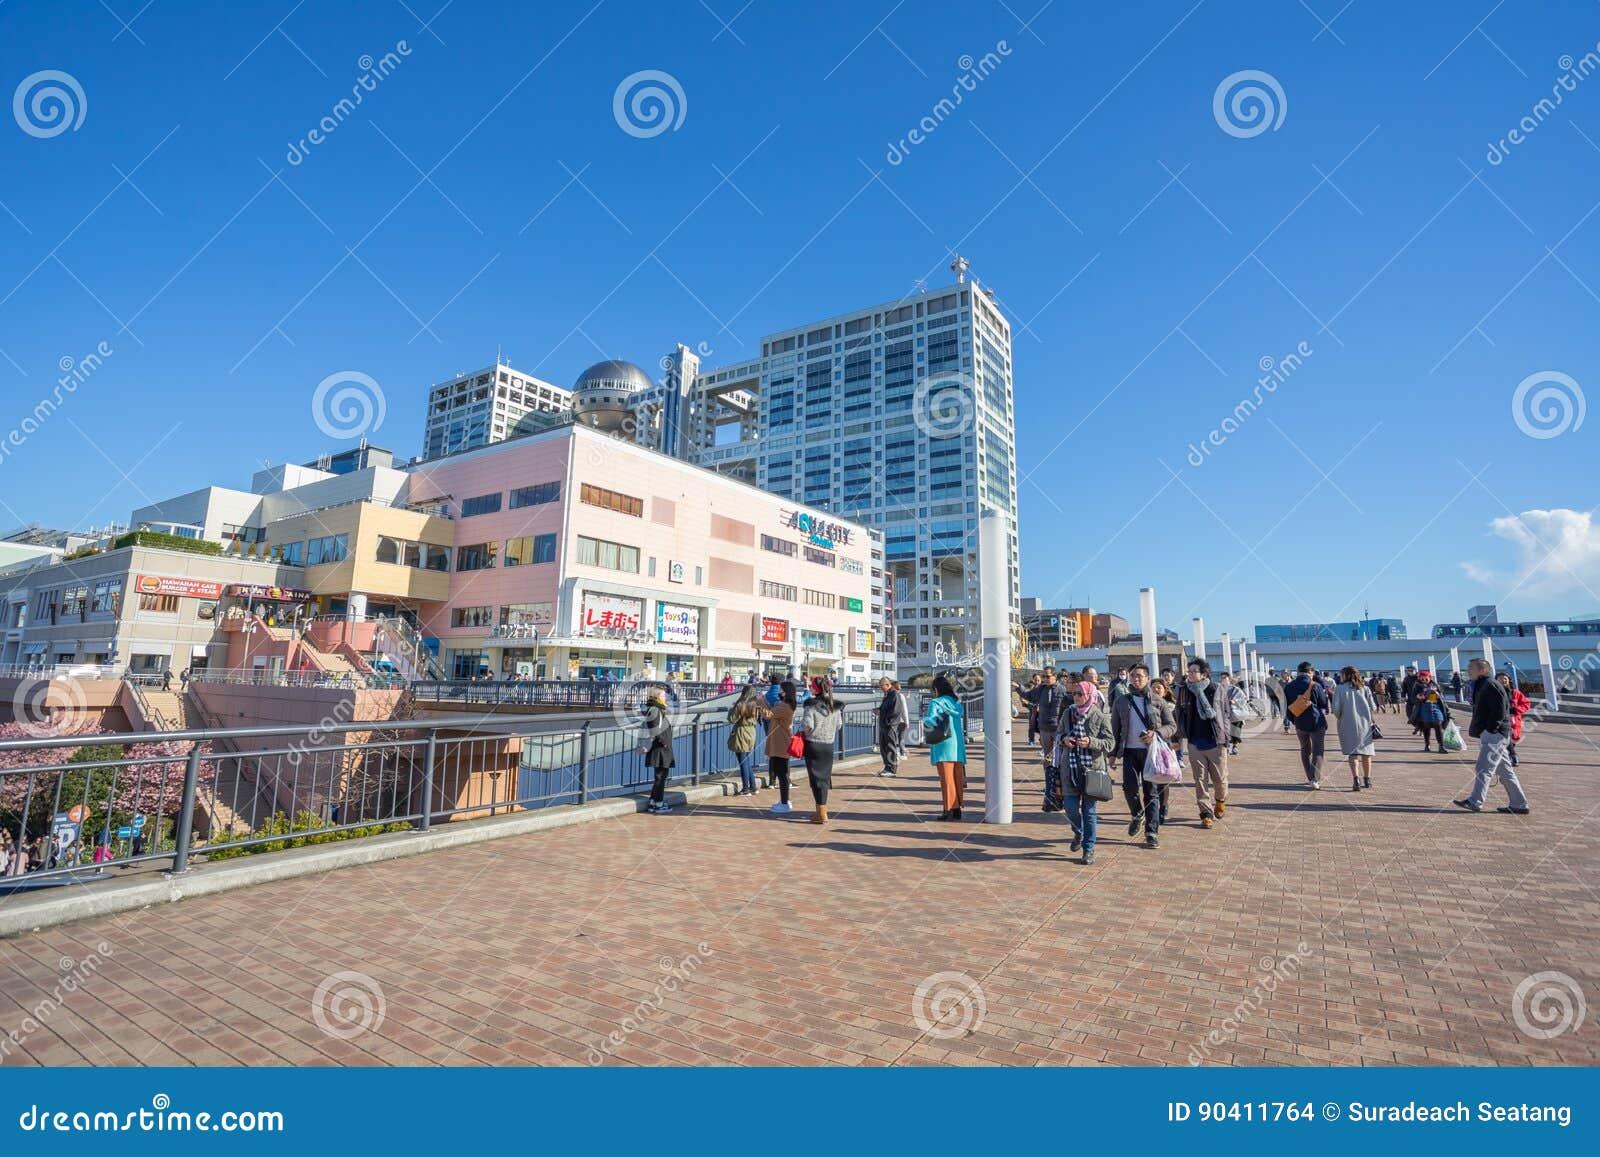 Aqua City Odaiba e costruzione di Fuji TV